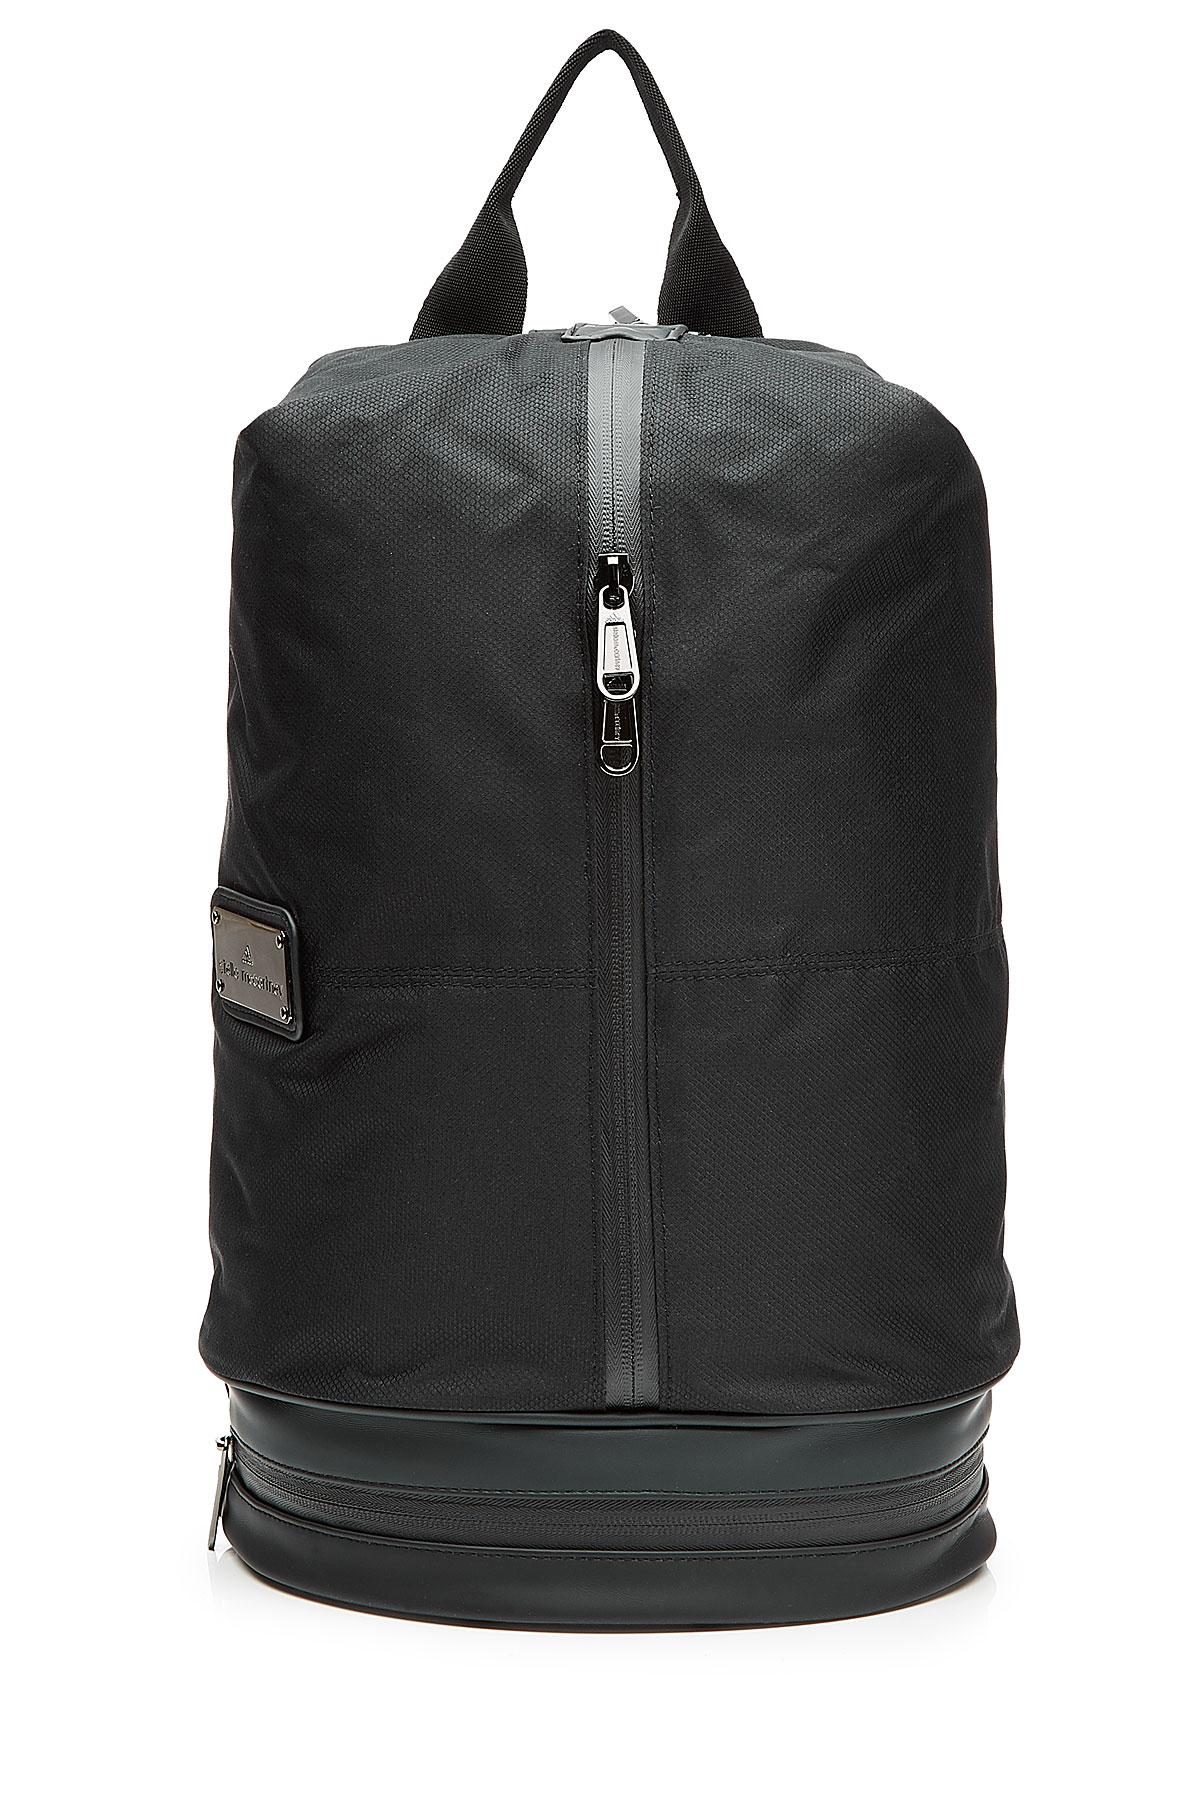 3198463508 Adidas By Stella Mccartney Gym Sack Backpack